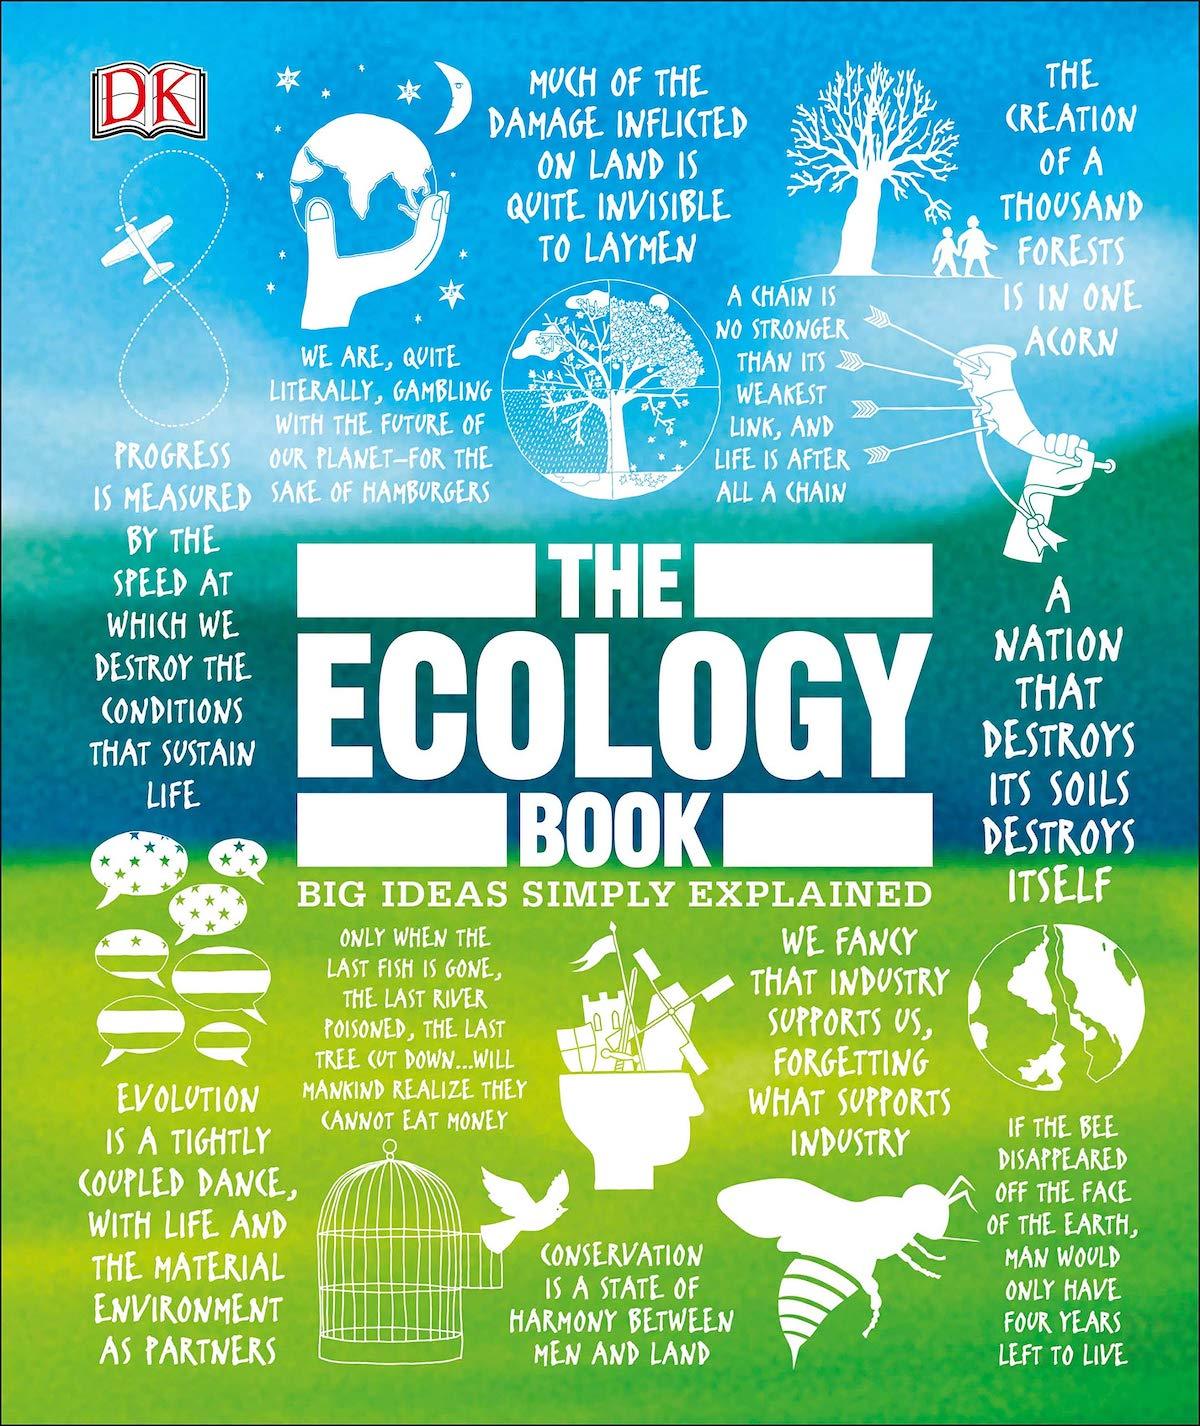 Обложка книги Tony Juniper: The Ecology Book. Big Ideas Simply Explained.Dorling Kindersley, 2019 год